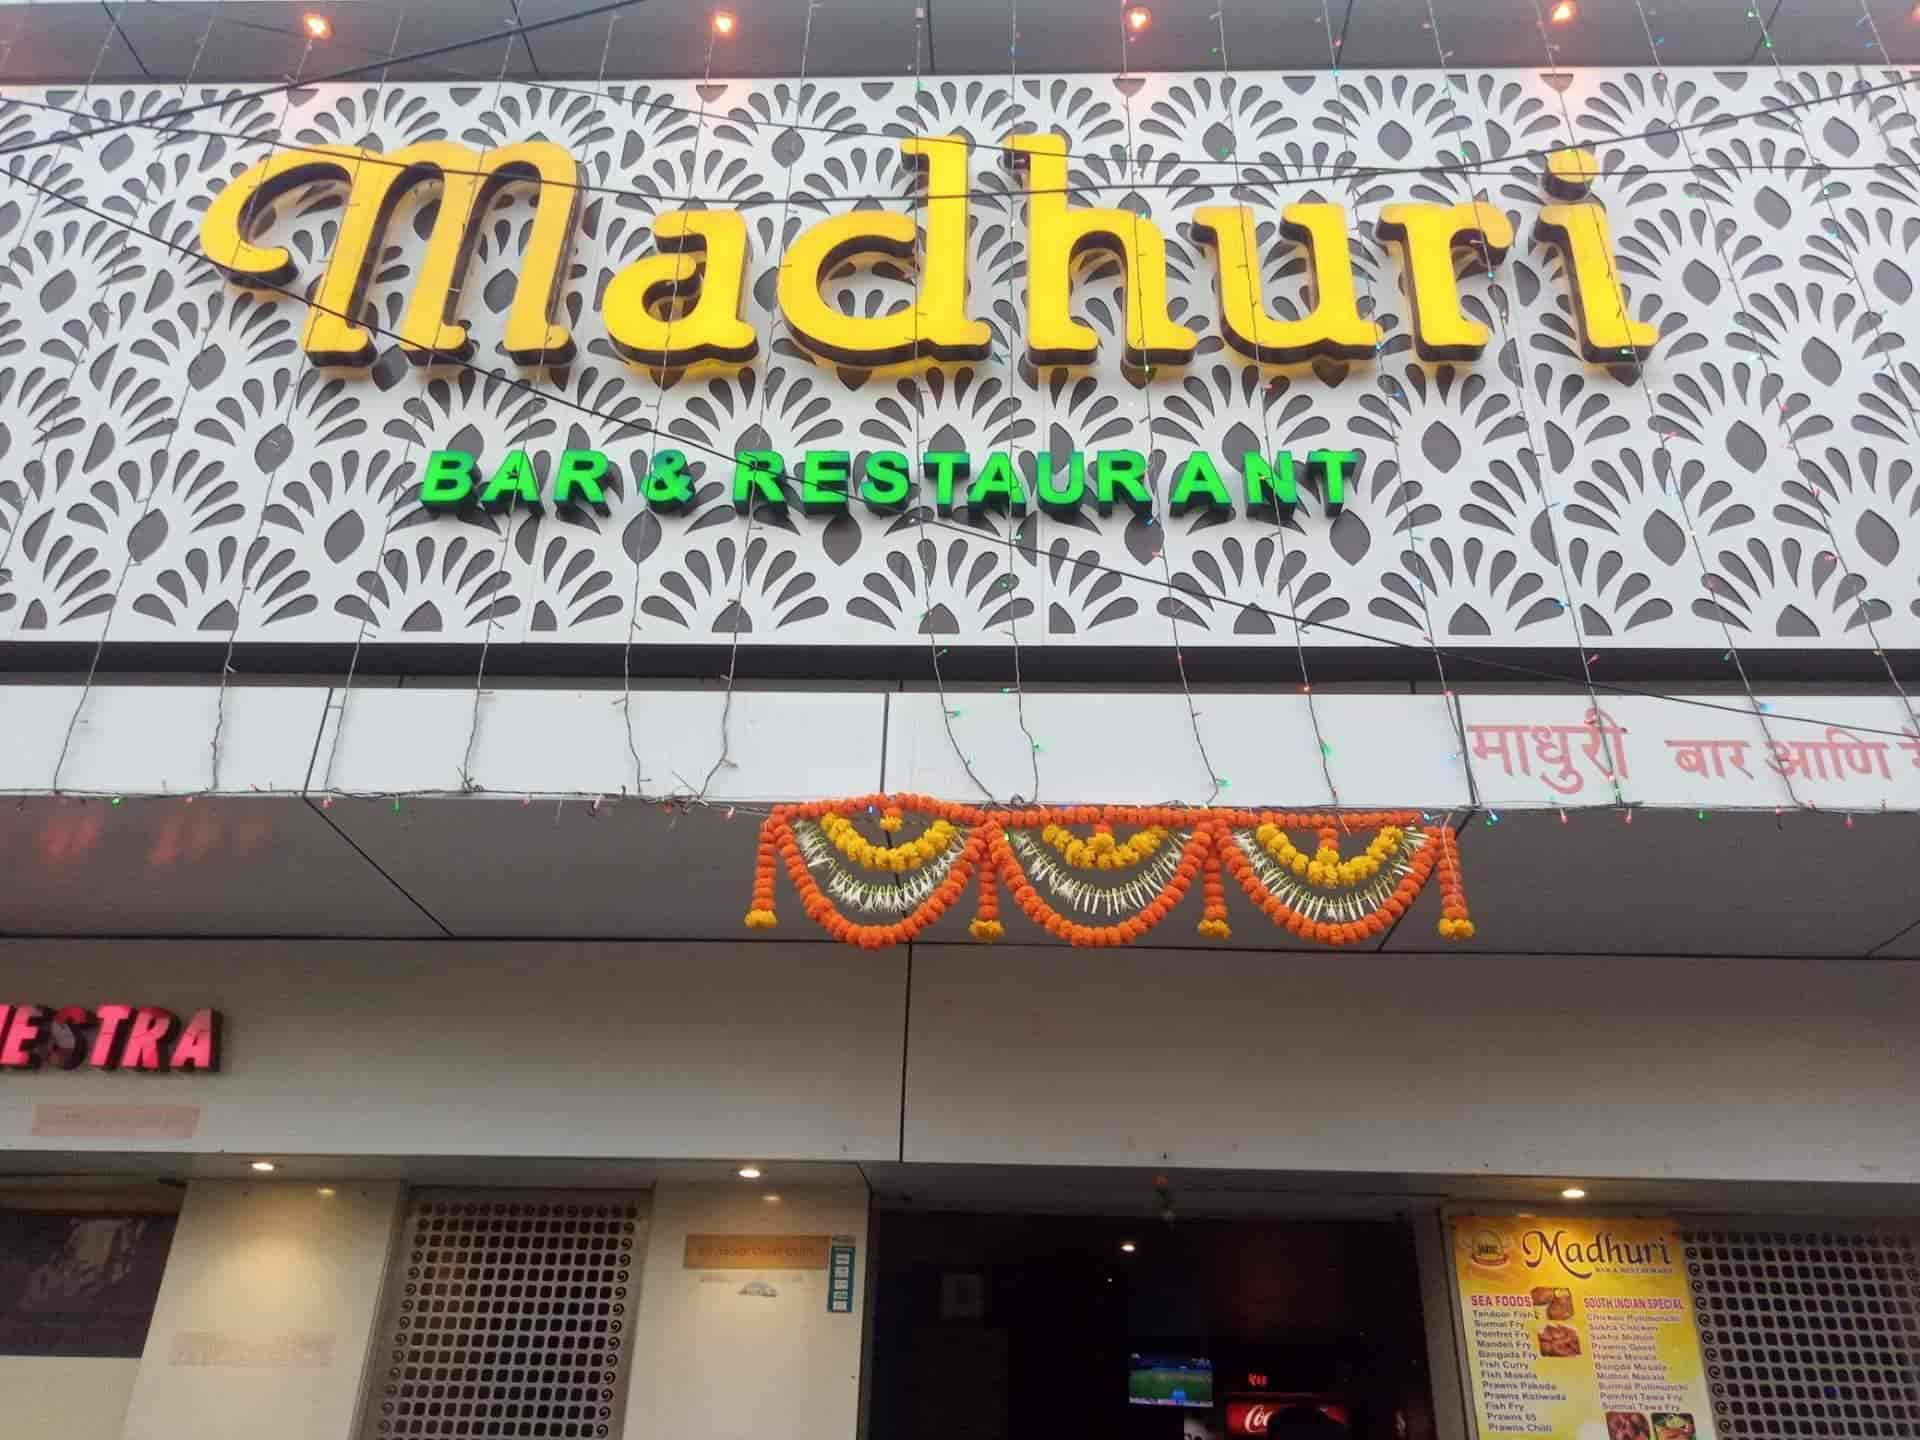 Madhuri Bar And Restaurant, Andheri East, Mumbai - North